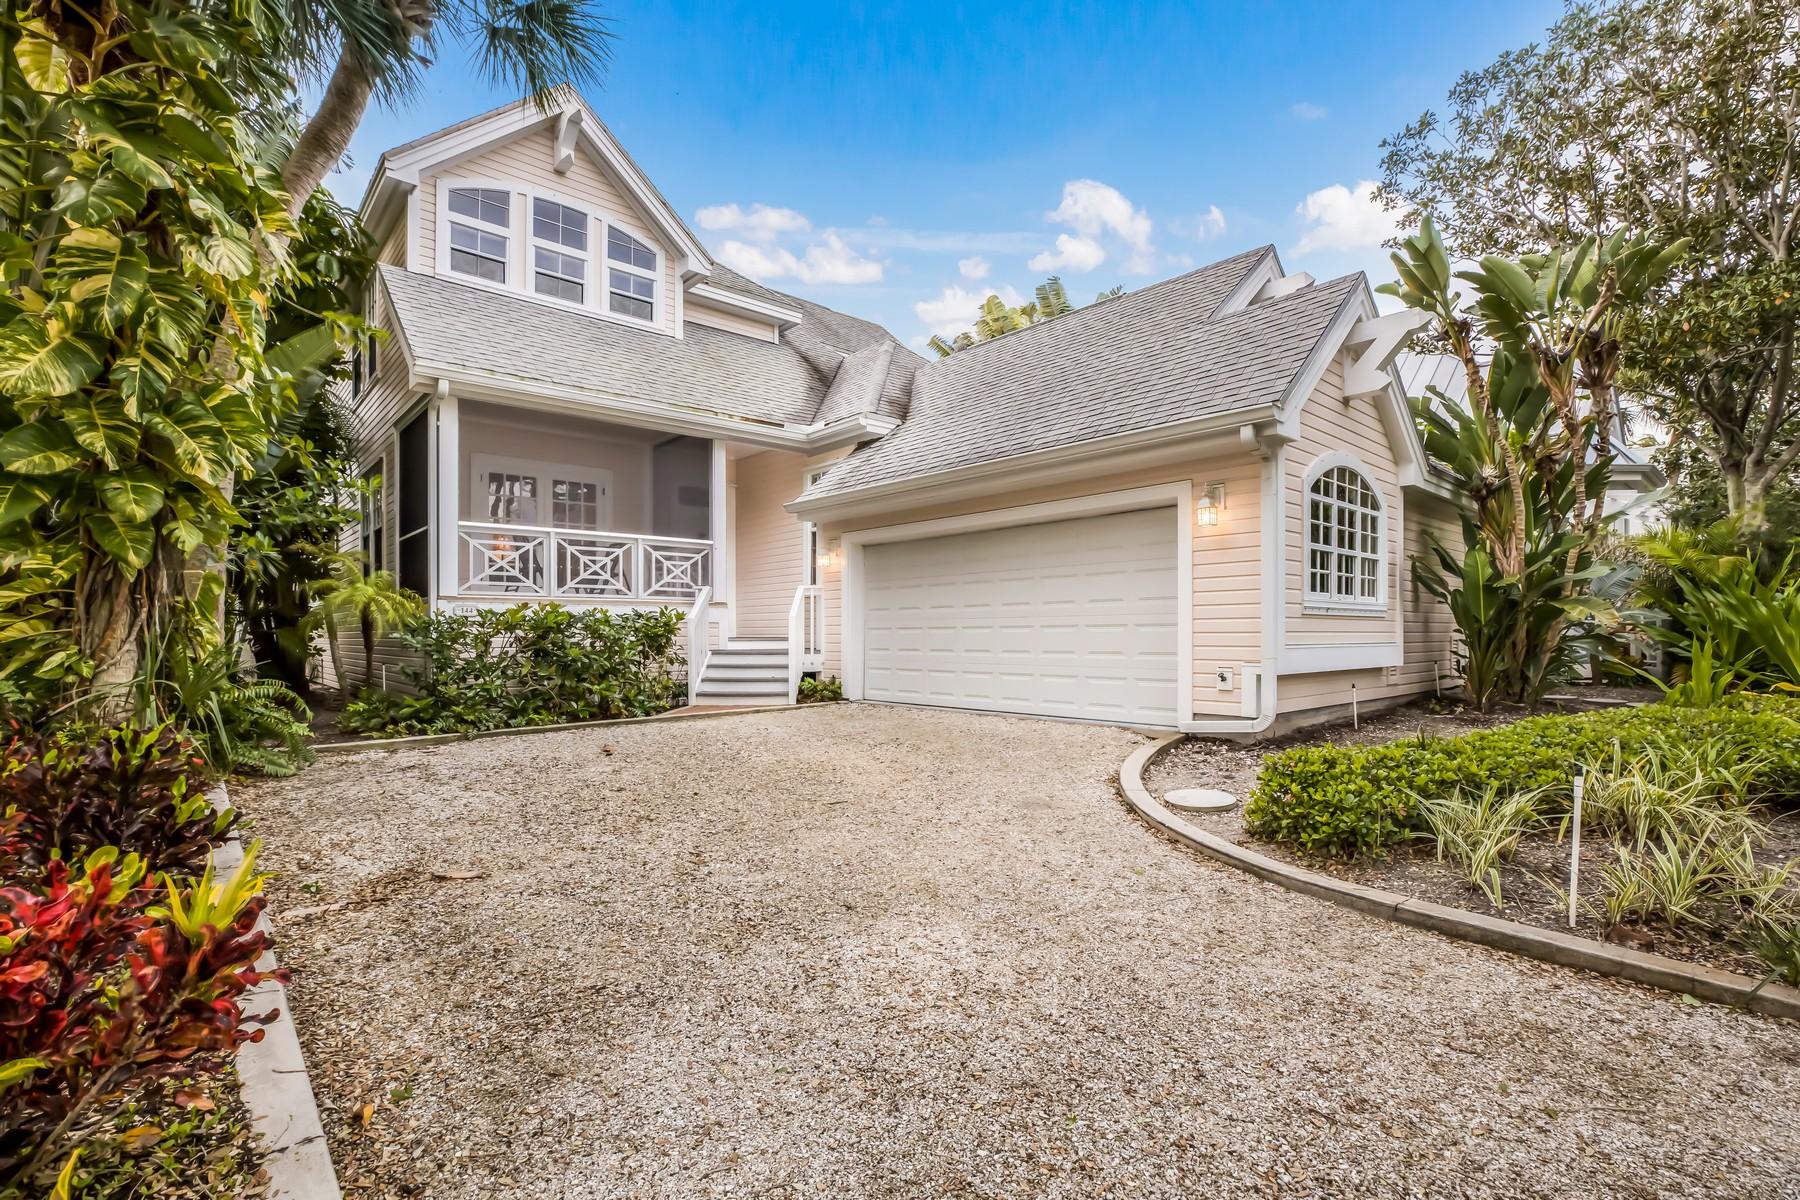 Single Family Homes for Active at 144 Carrick Bend Lane Boca Grande, Florida 33921 United States